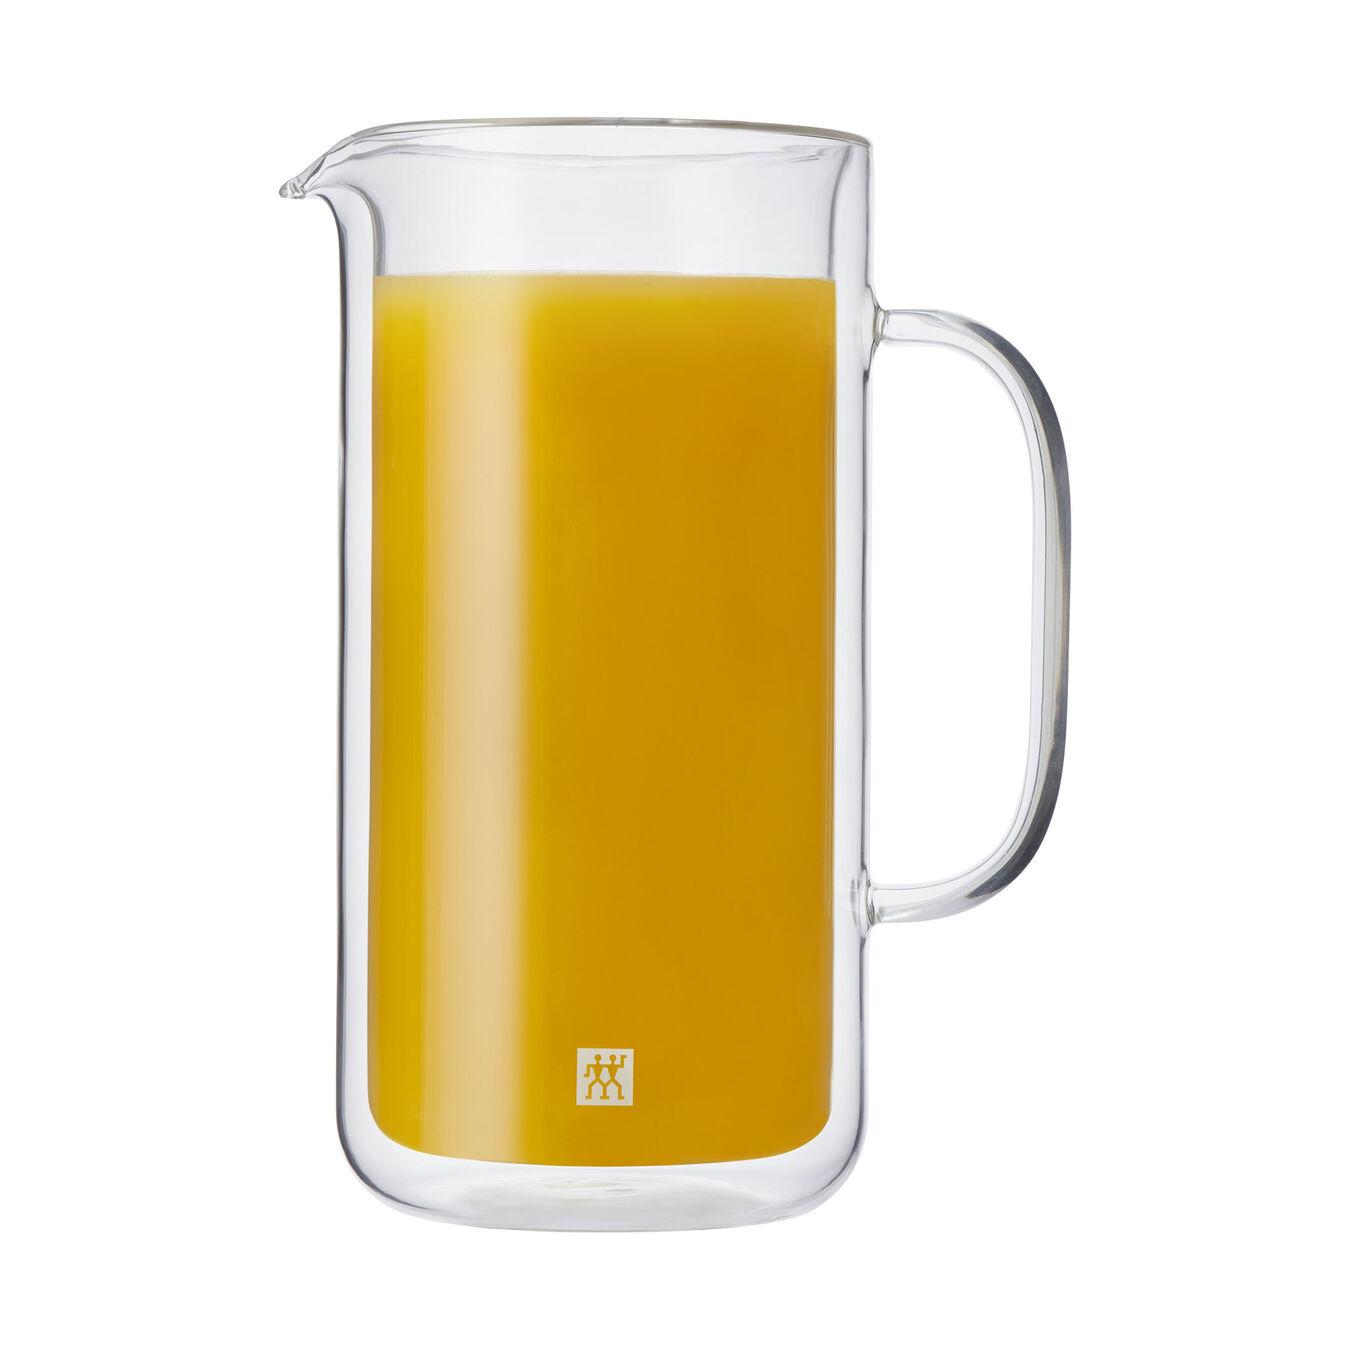 Double-Wall Glass Carafe, 800 ml | Borosilicate glass,,large 1